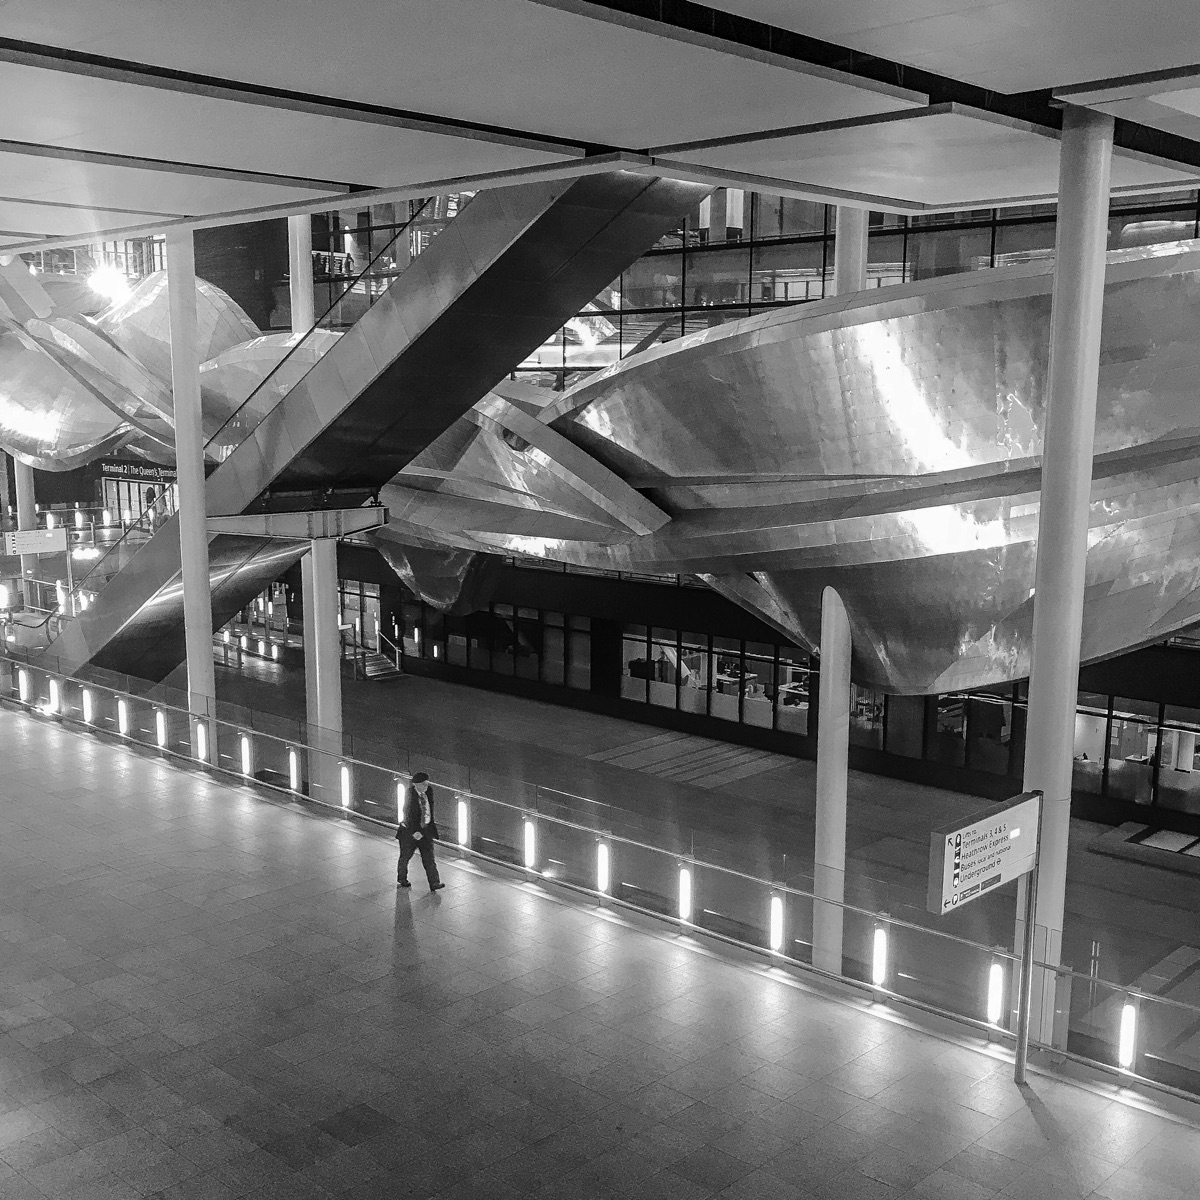 Insinuation Heathrow Terminal 2 - charles_3_1416 | ello